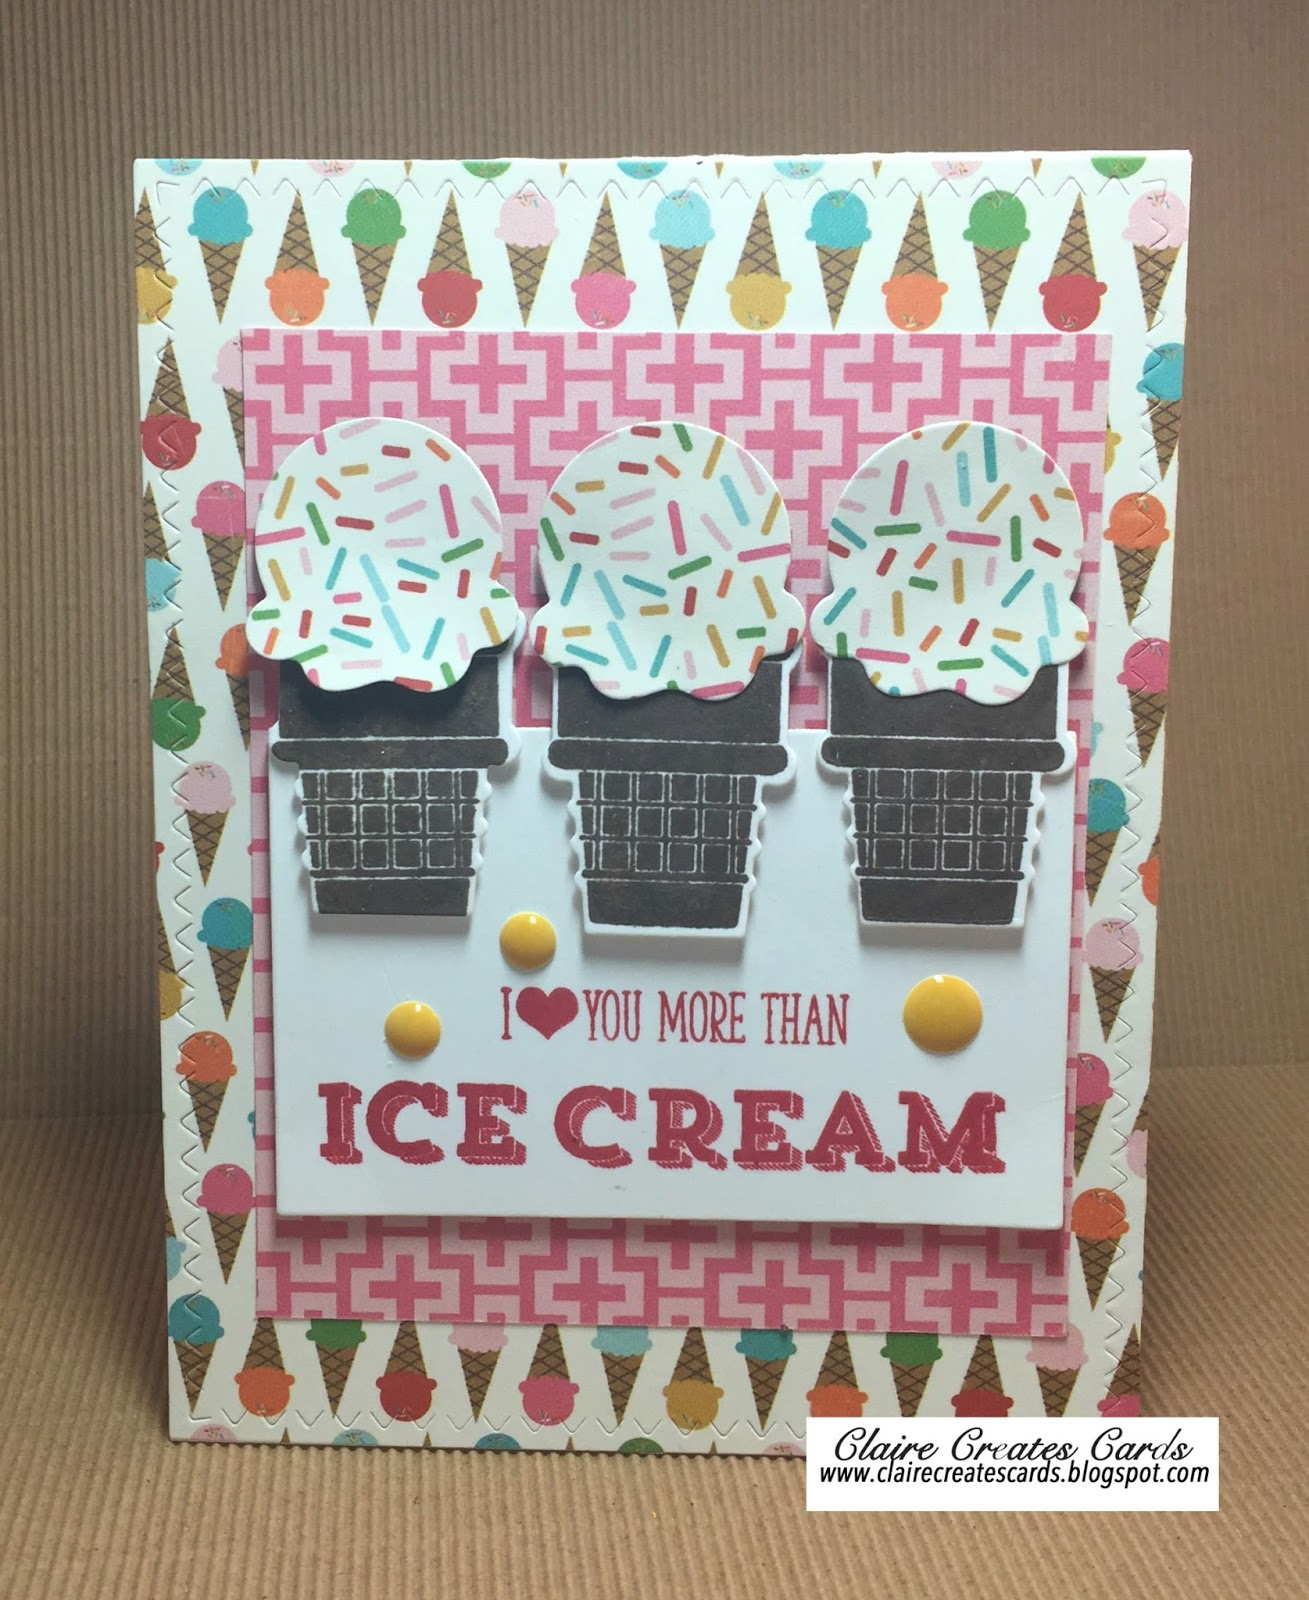 I Love You More Than Ice Cream: Claire Creates Cards: I Love You More Than Ice Cream